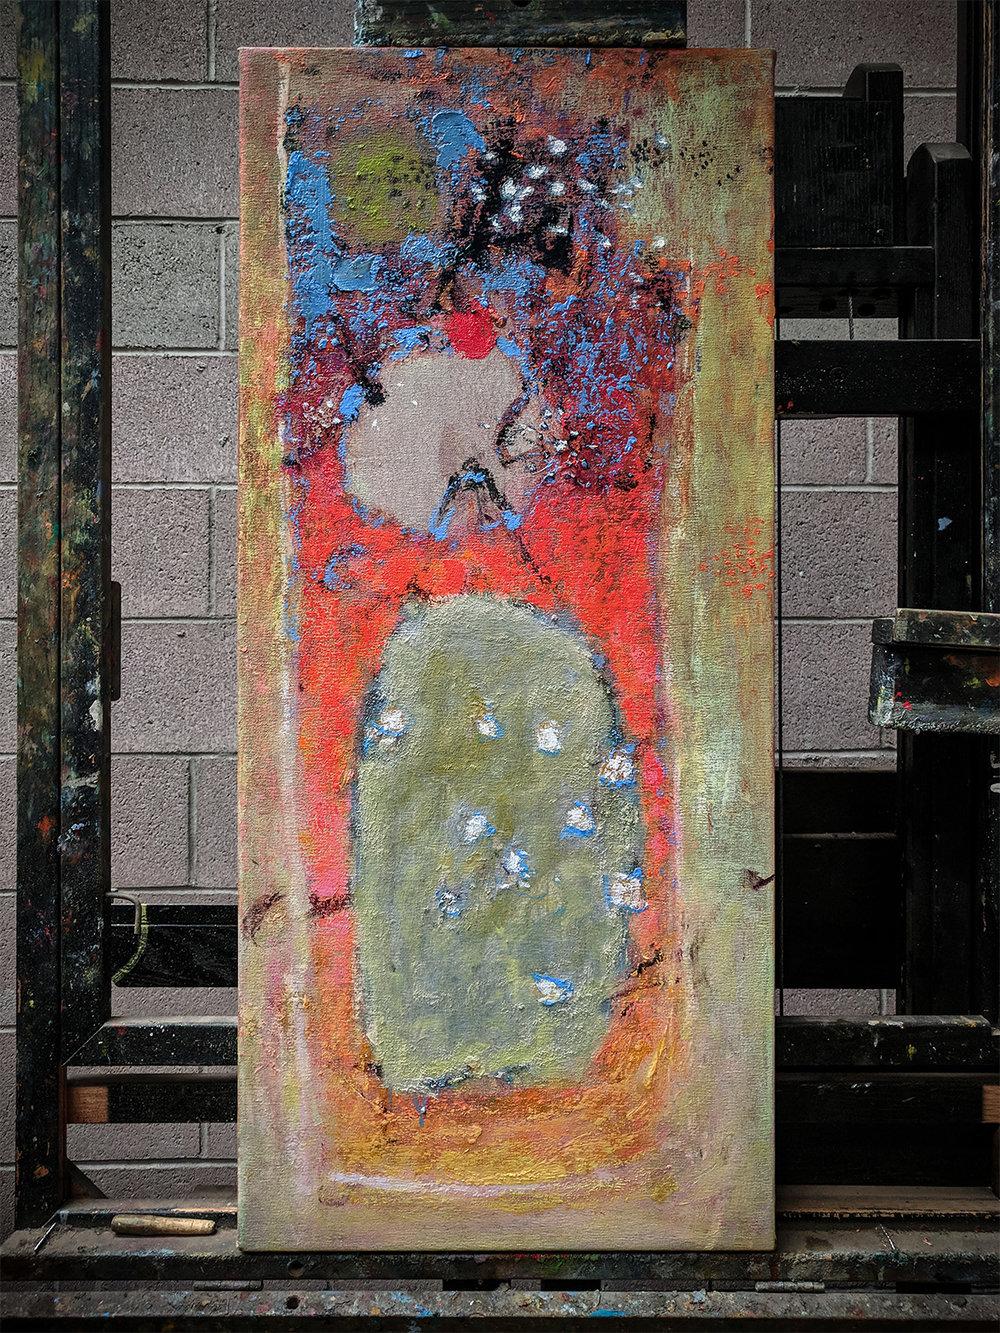 smaller oil on canvas in progress at Santa Fe studio